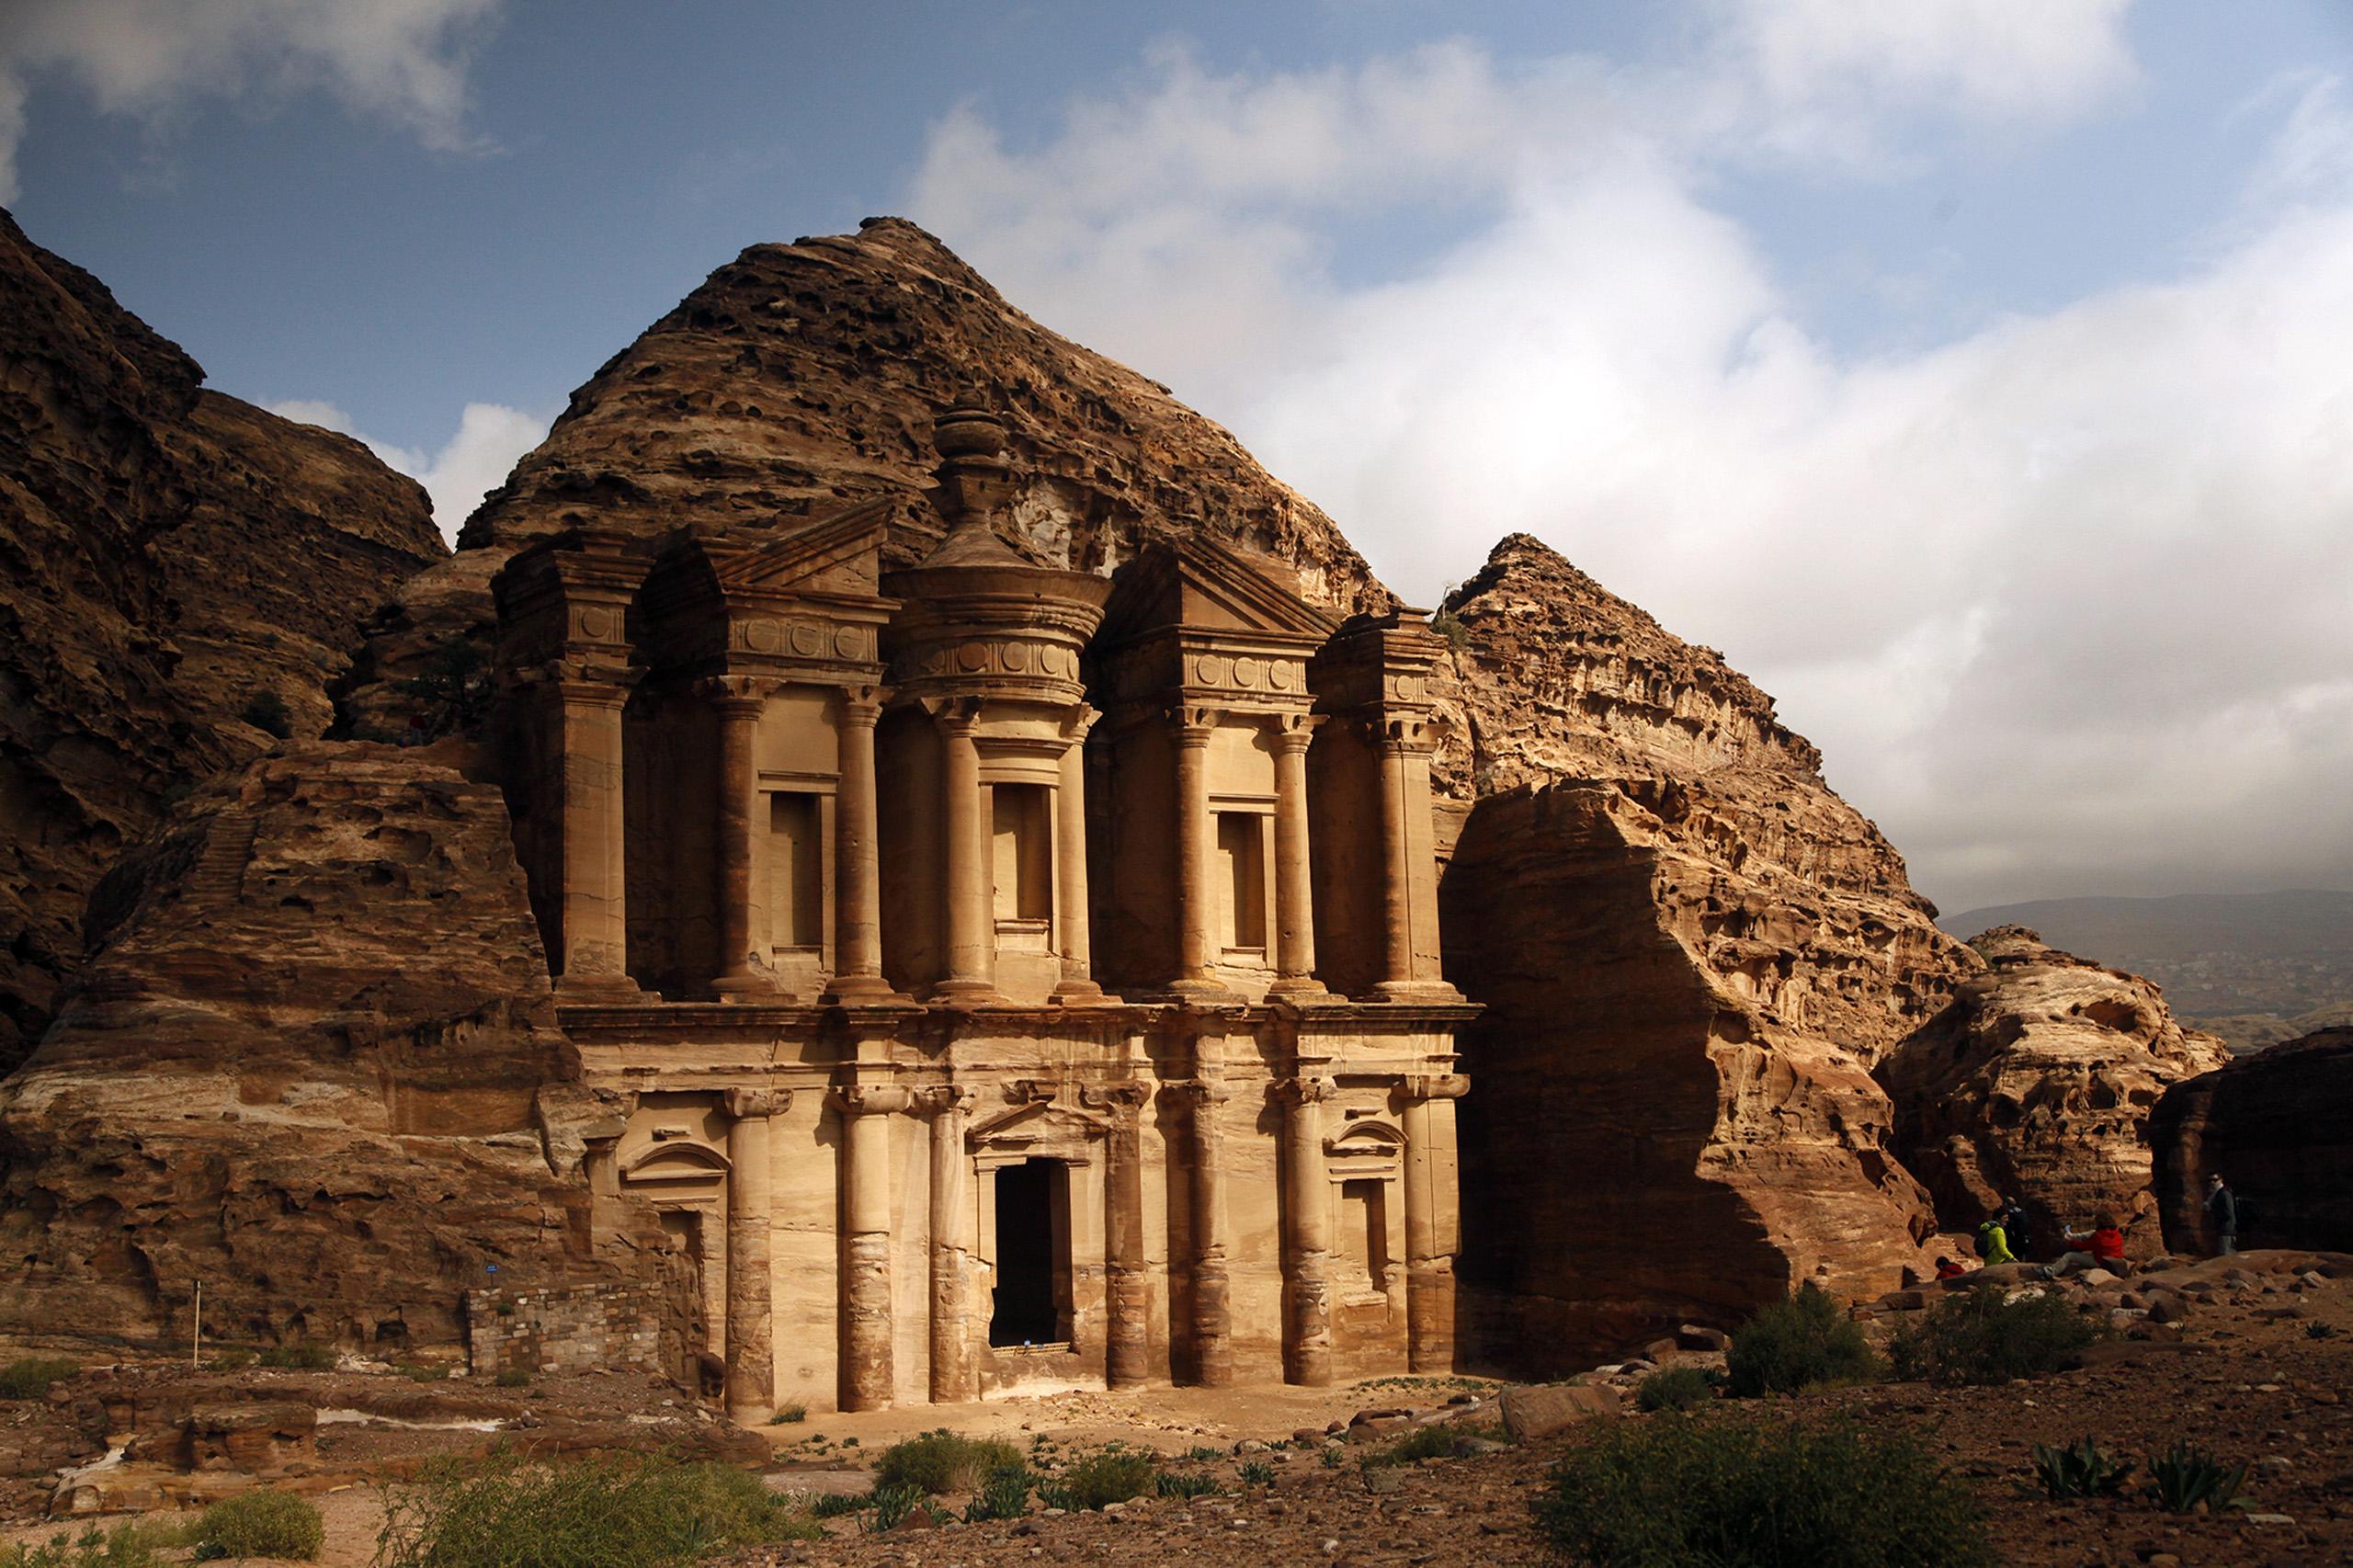 The monastery in Petra, a world famous landmark in southern Jordan, on Feb. 23, 2016.